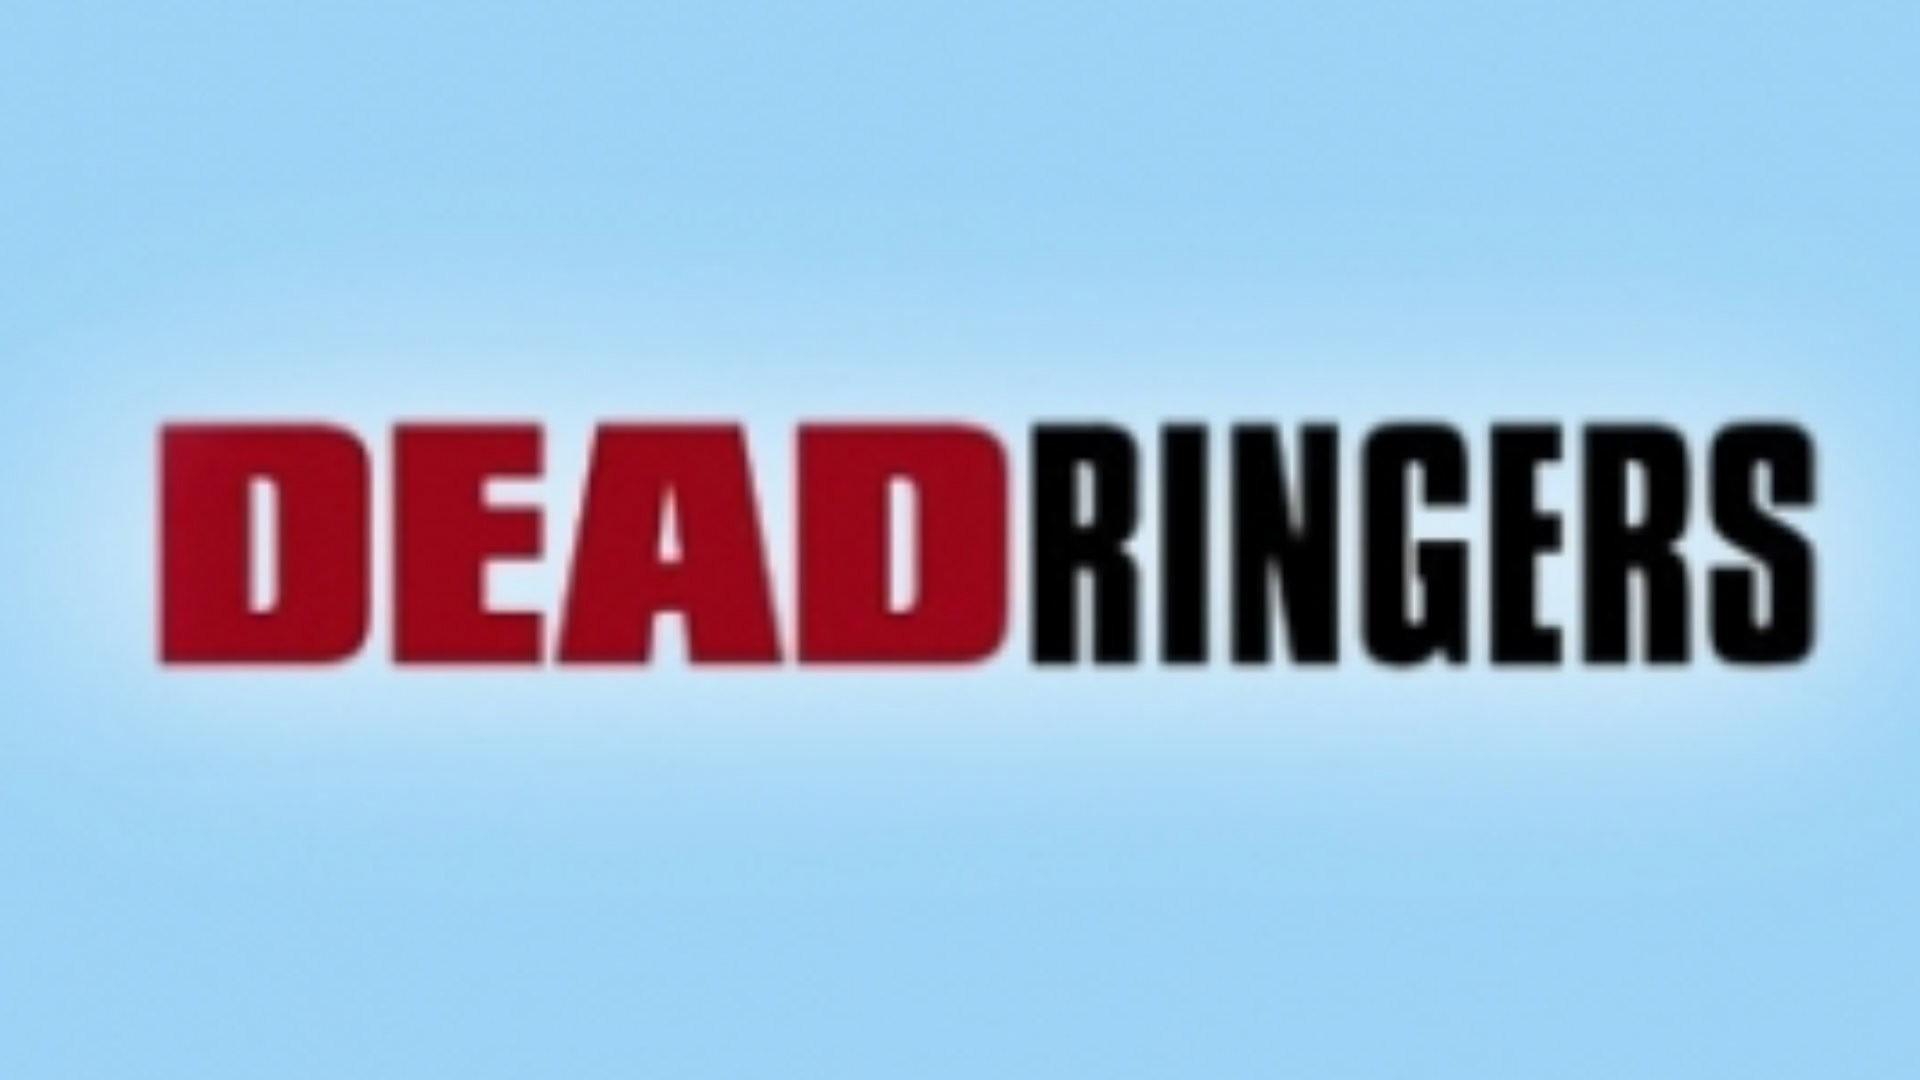 Show Dead Ringers